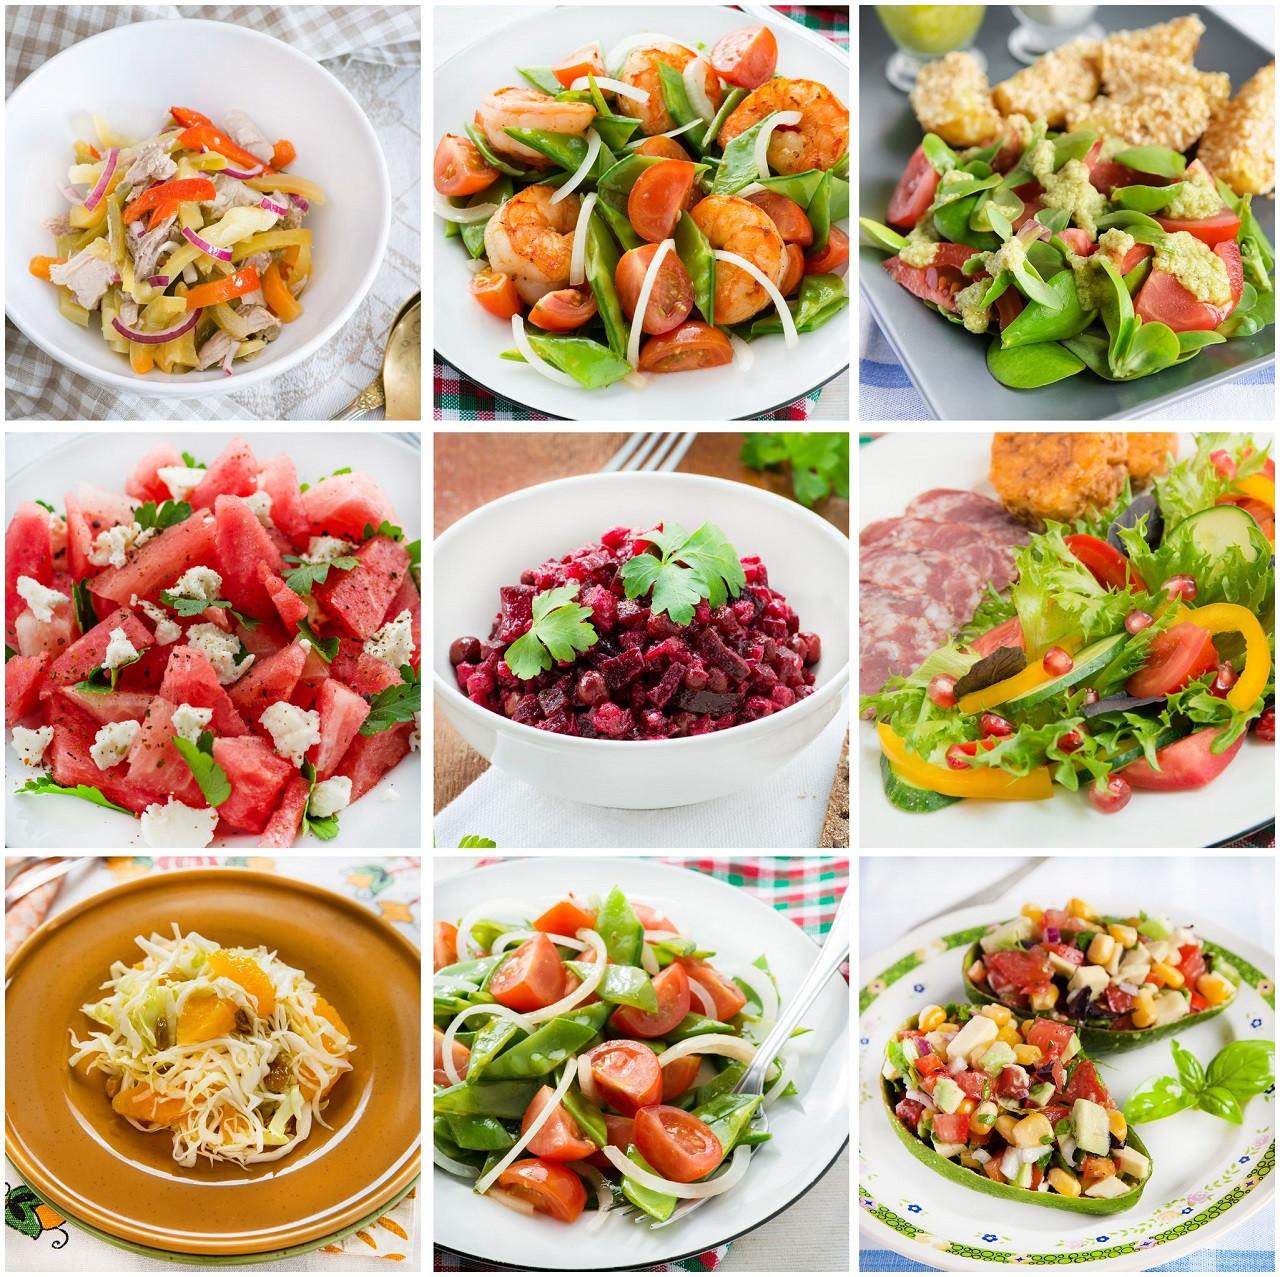 Healthy Dinner Salads  WatchFit 5 Crunchy Healthy Salads For Dinner